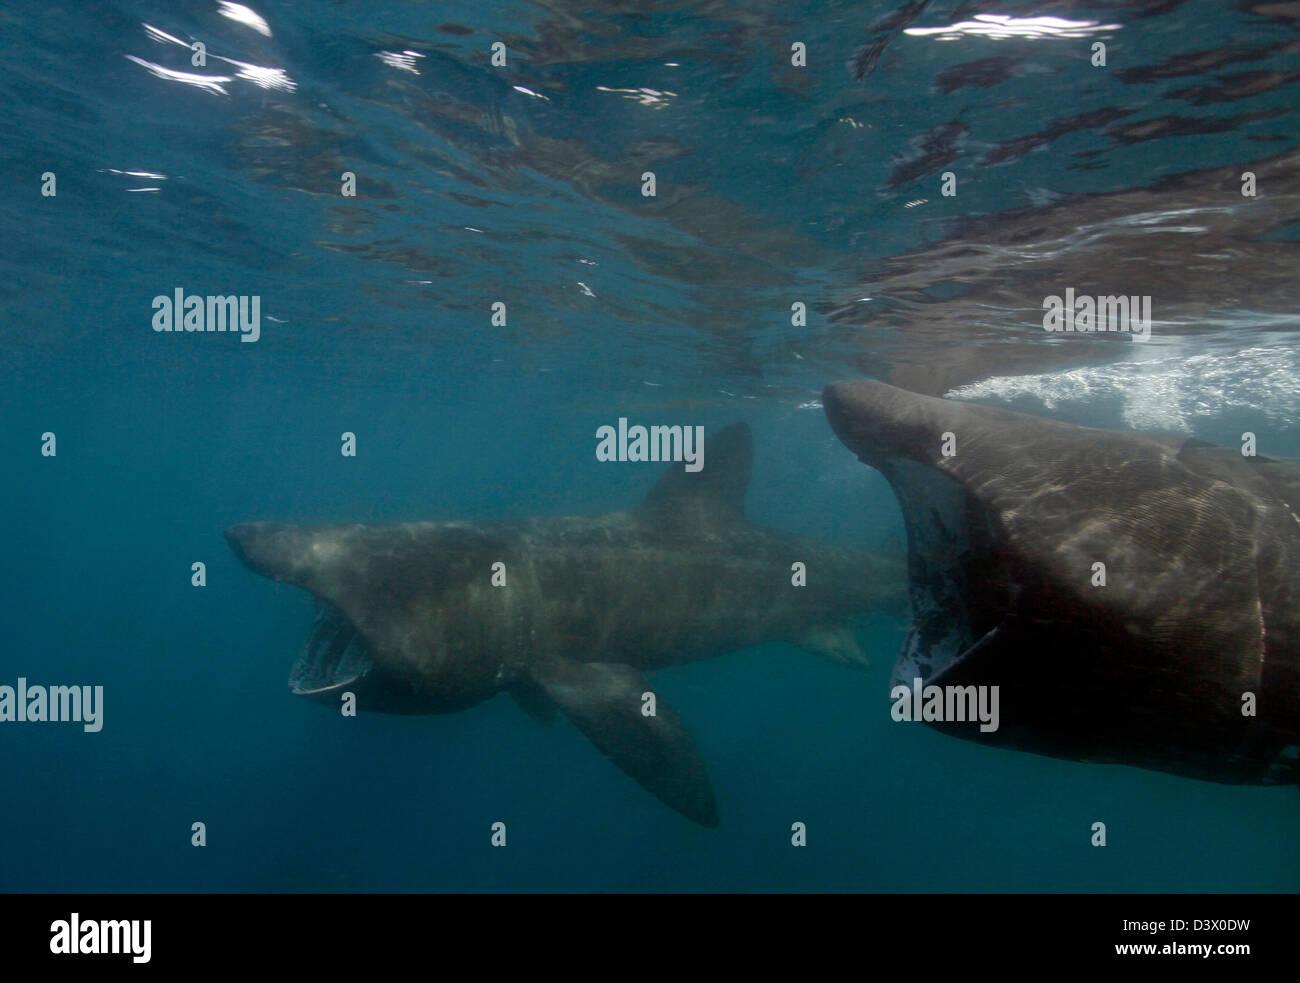 Basking Shark, Cetorhinus maximus, Lands End, Cornwall, England - Stock Image